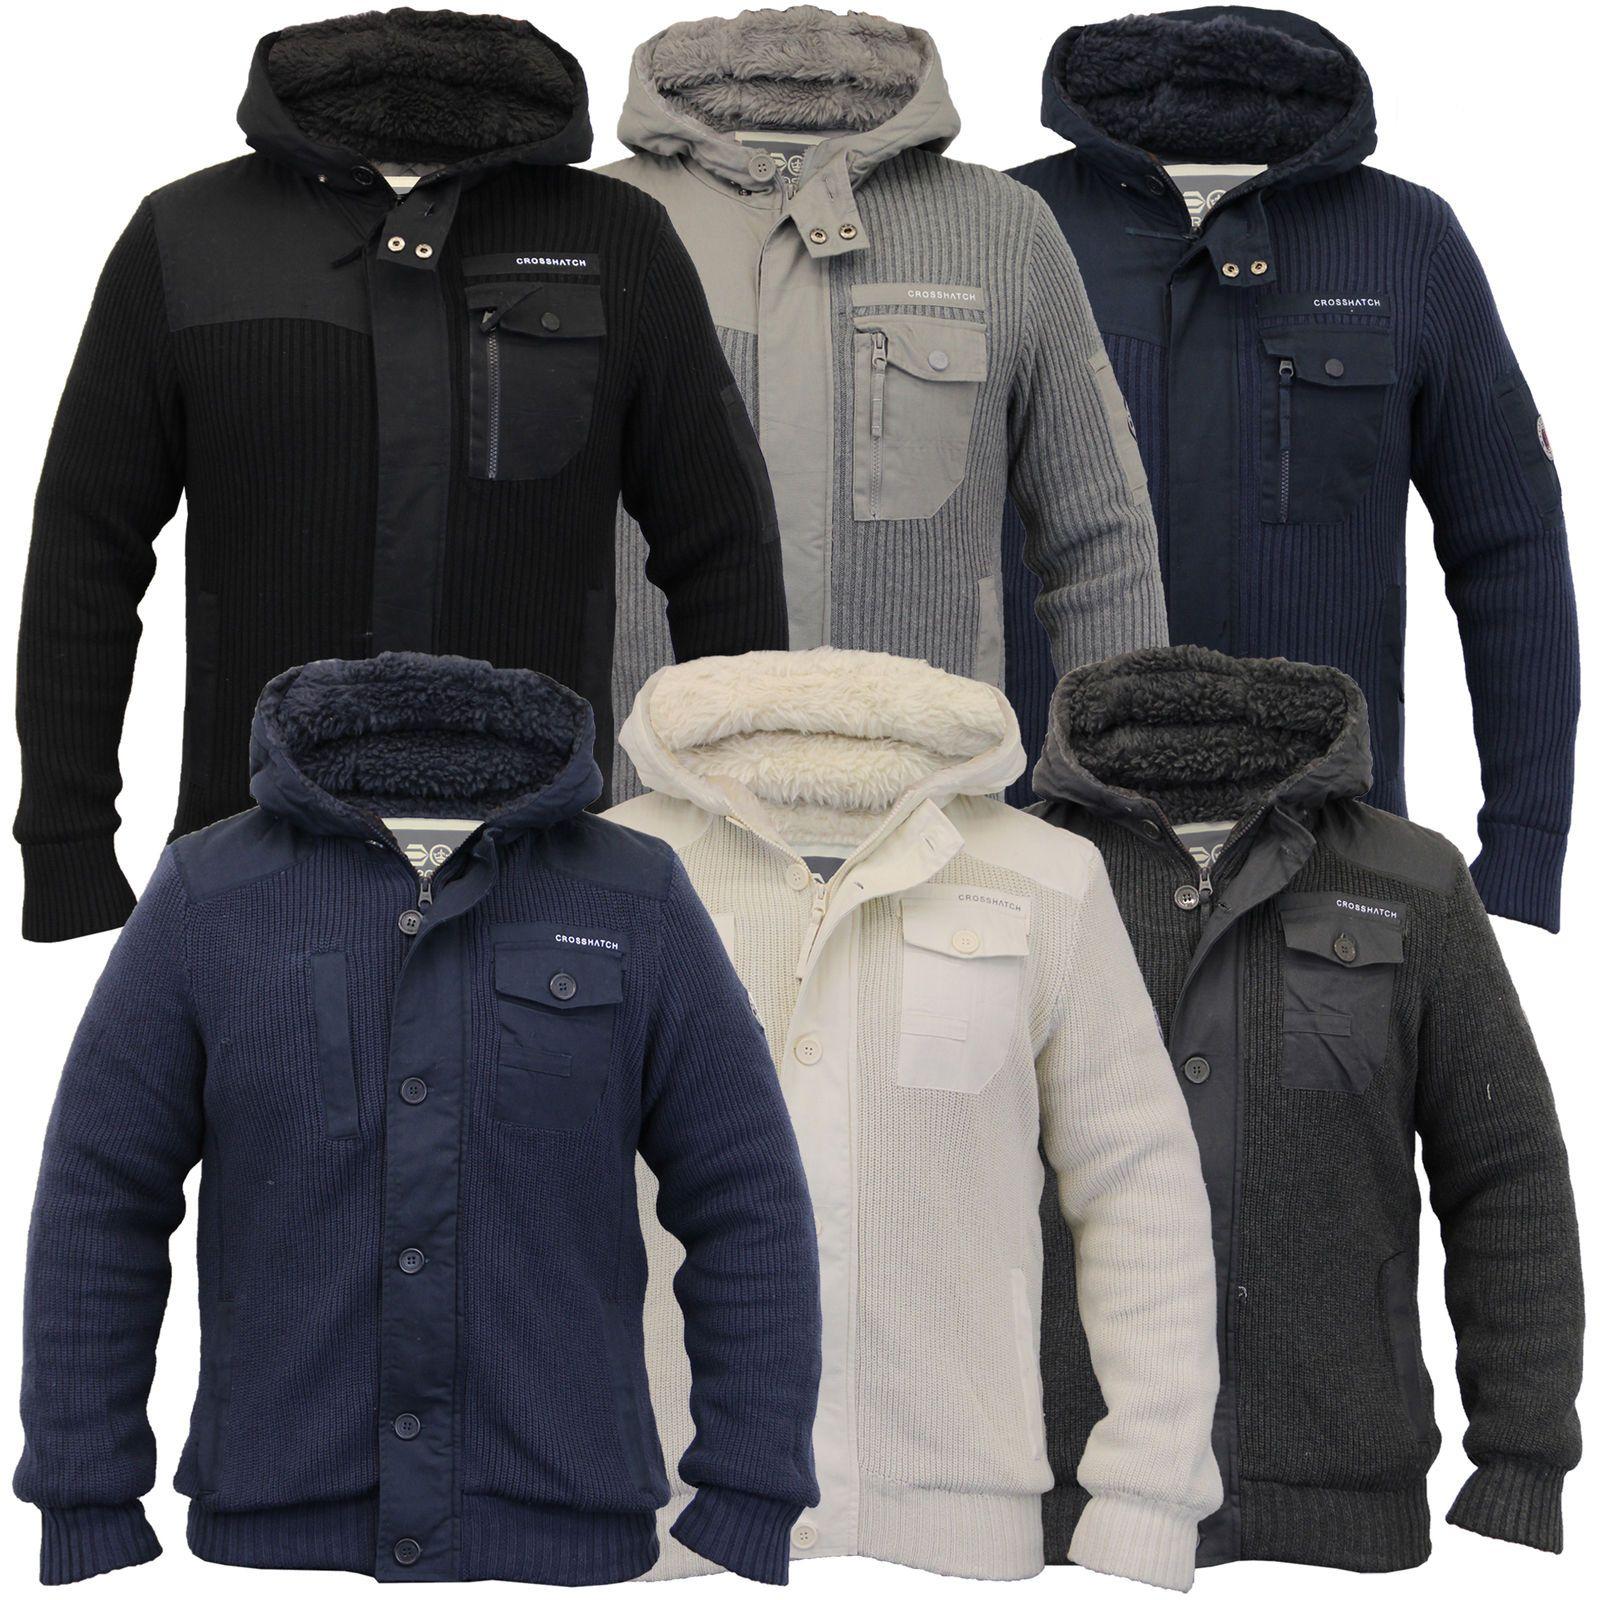 mens jacket crosshatch coat knitted hooded top sherpa fleece